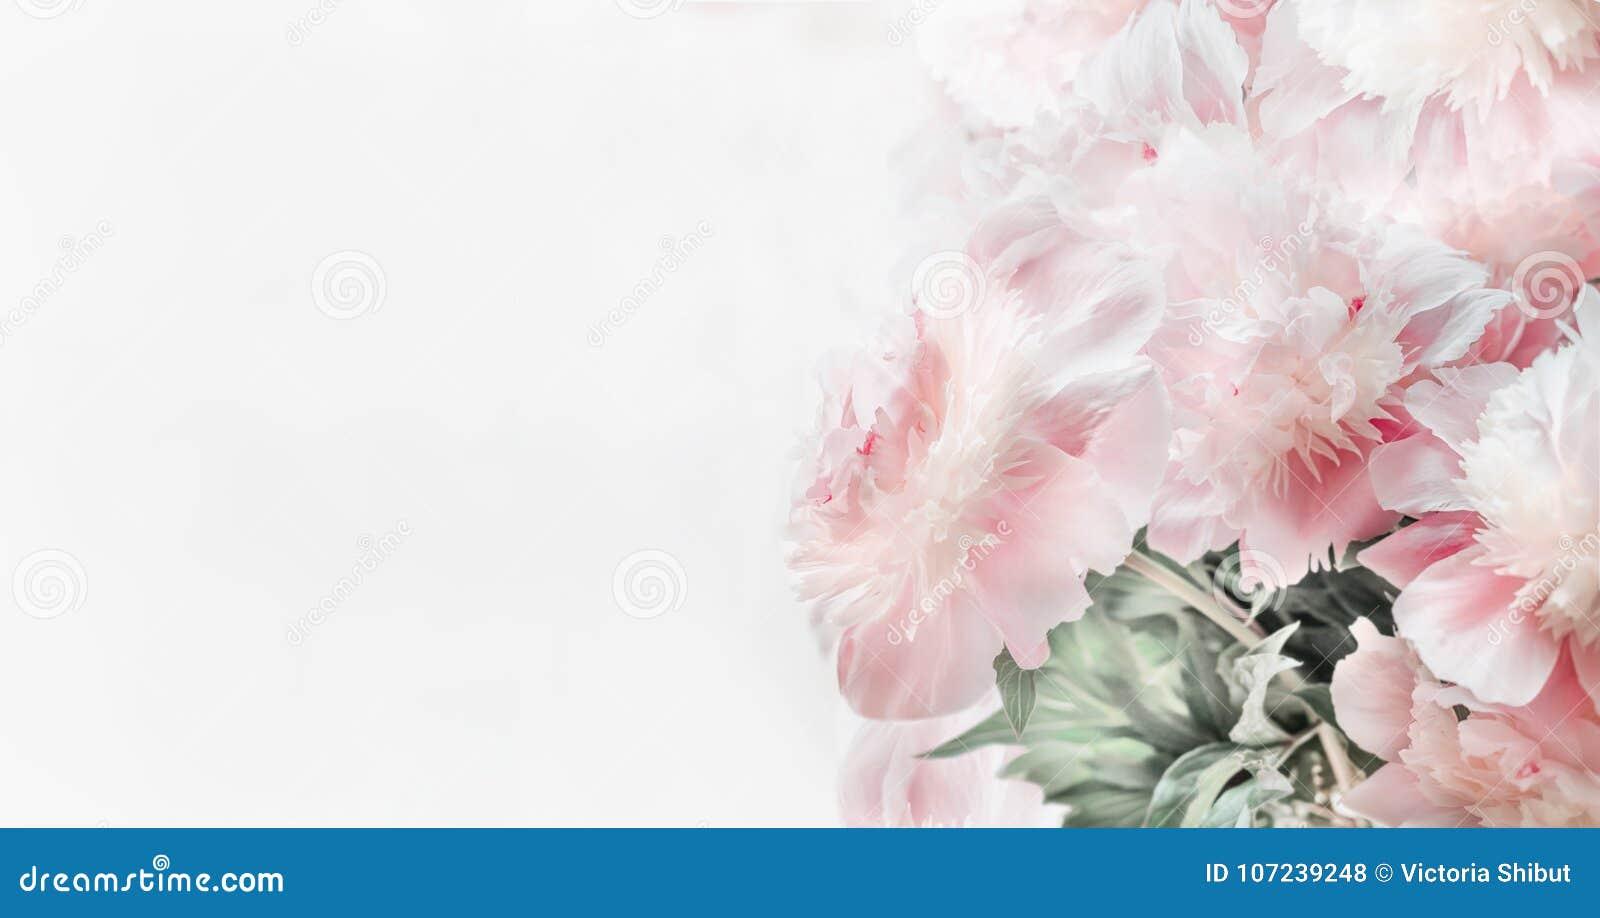 beautiful pastel pink peonies flowers on white background